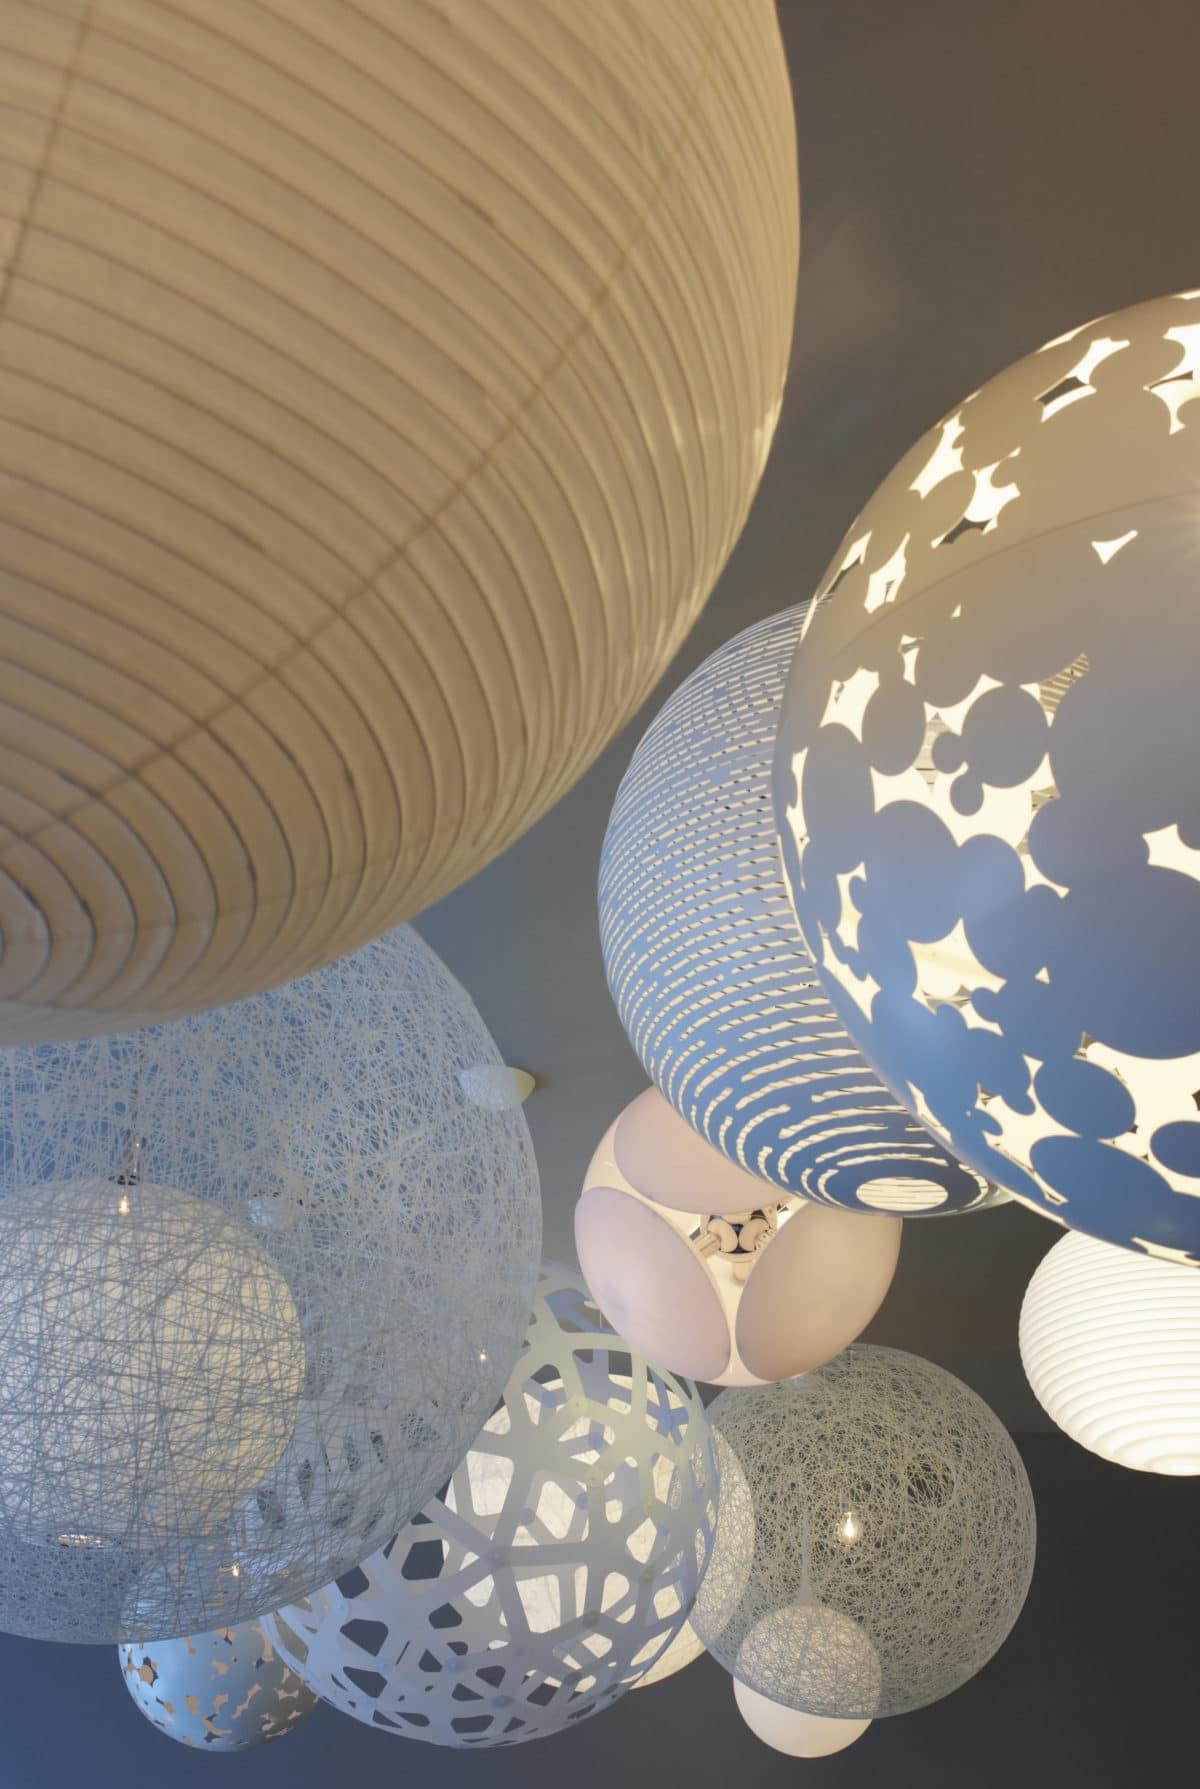 Hotelanmeldelse-Nobis-stockholm - GotravelingPress6.jpg